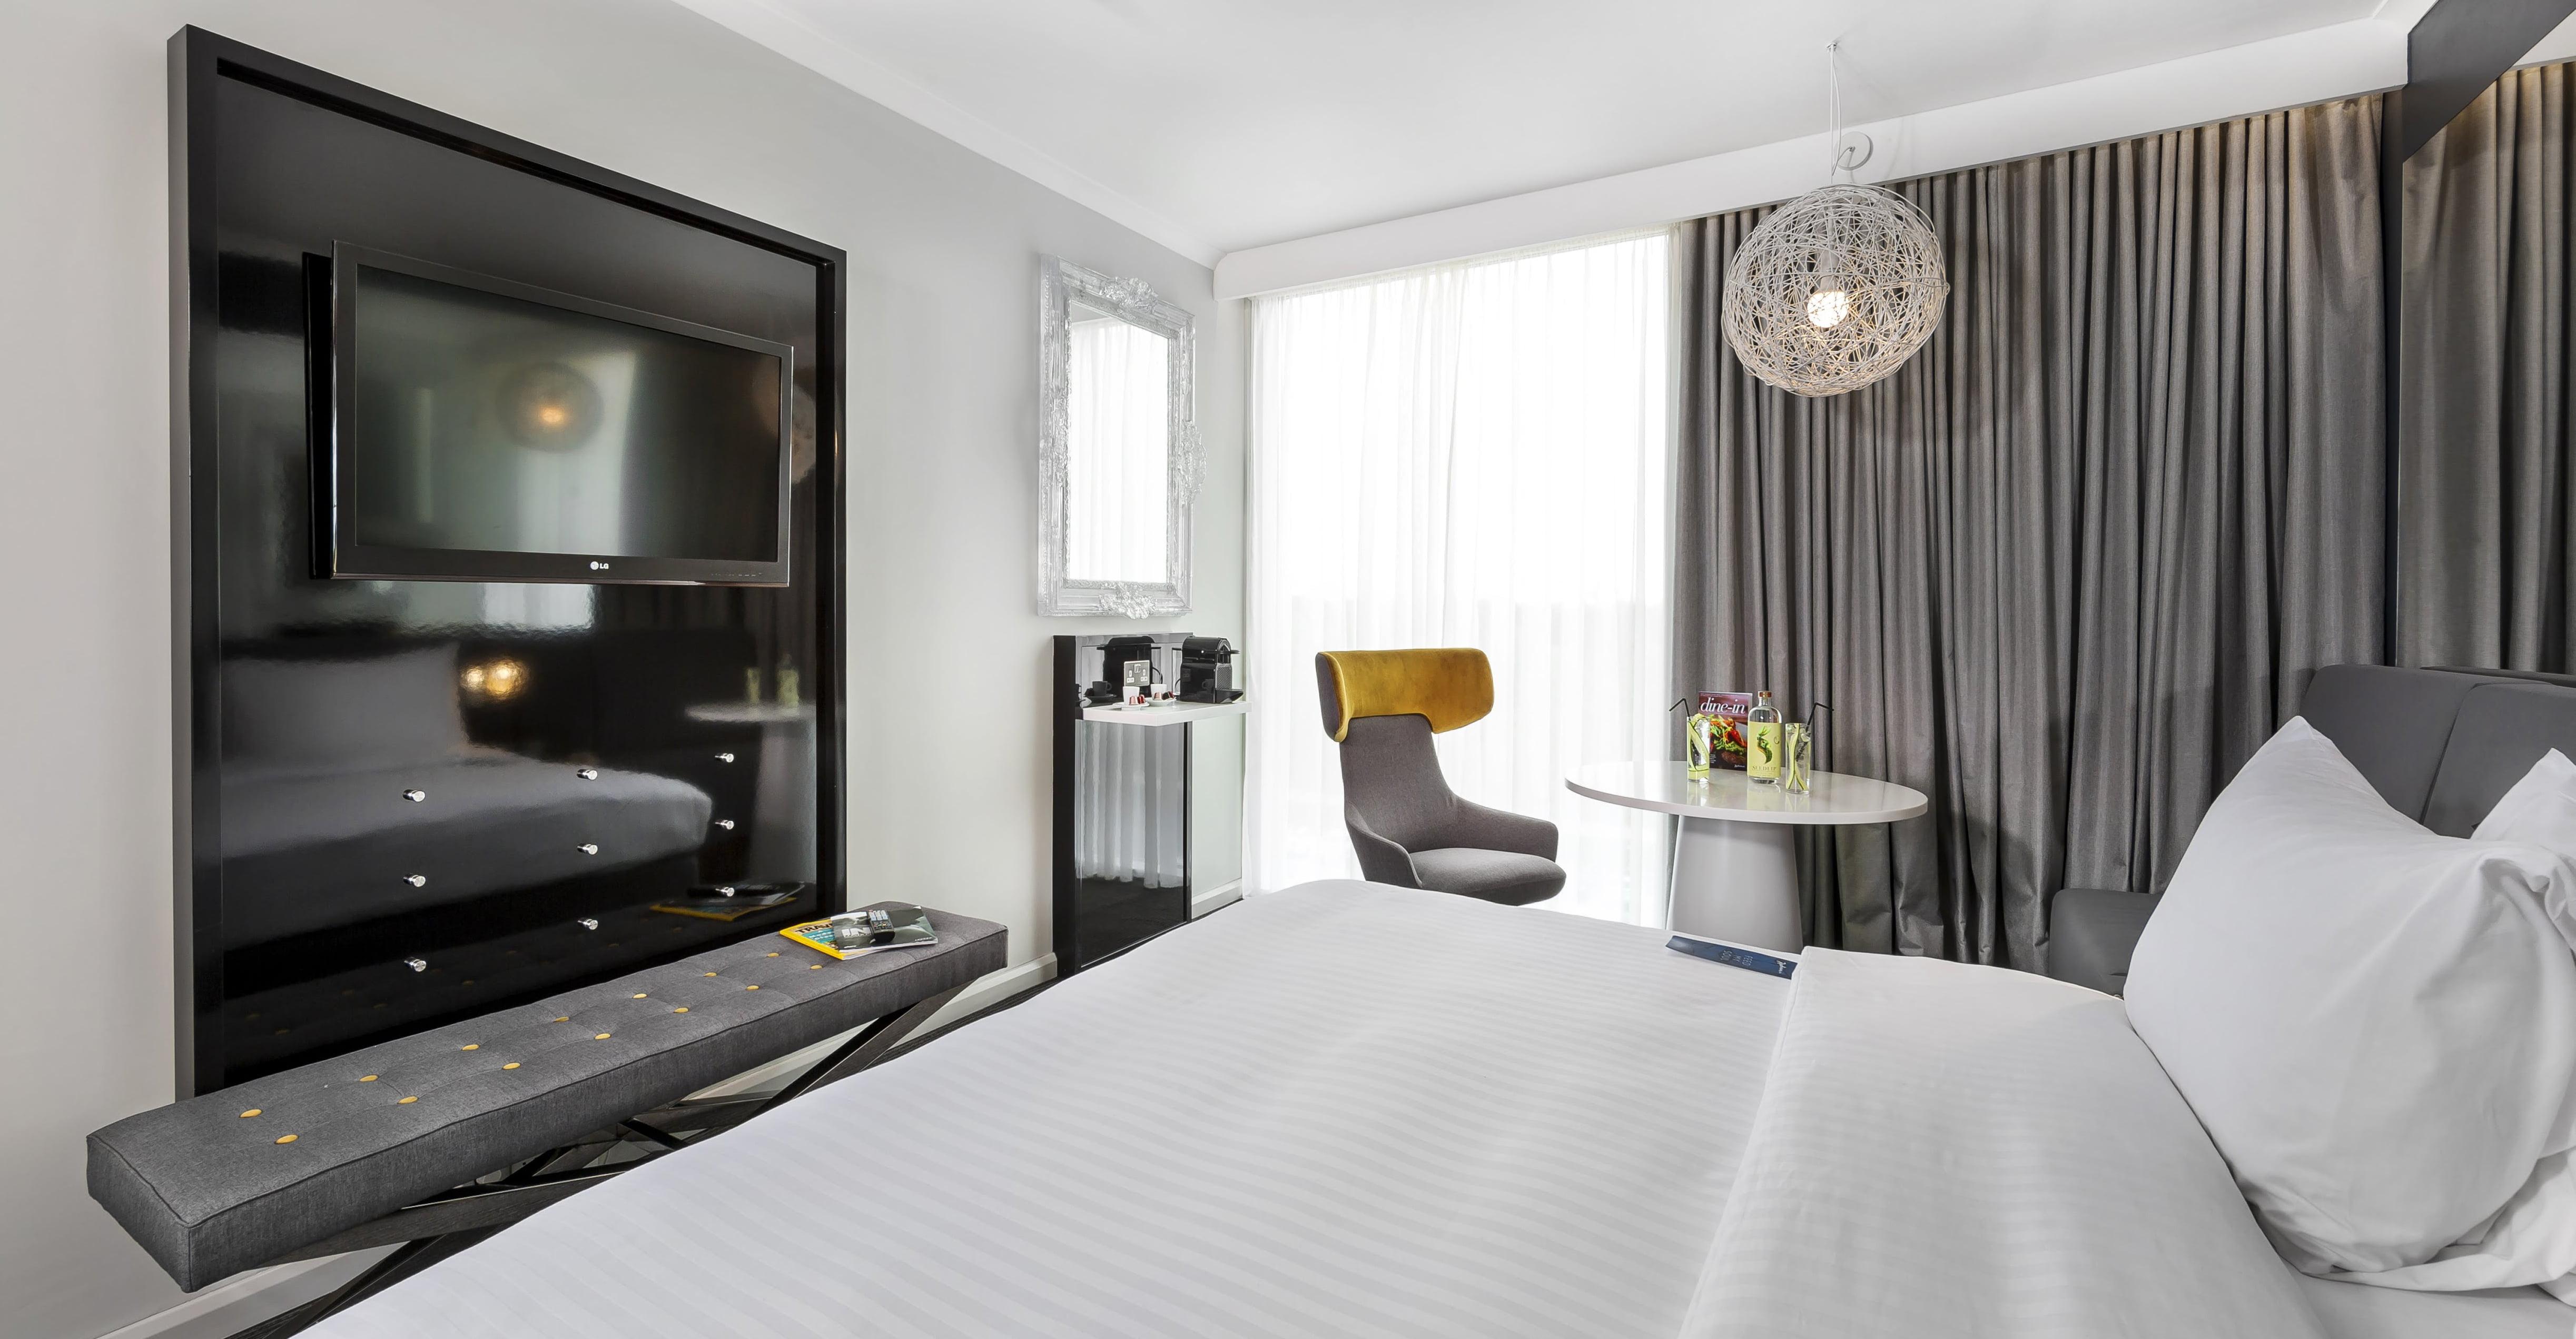 Radisson Blu Hotel London Stansted Undergoes 6m Refurbishment